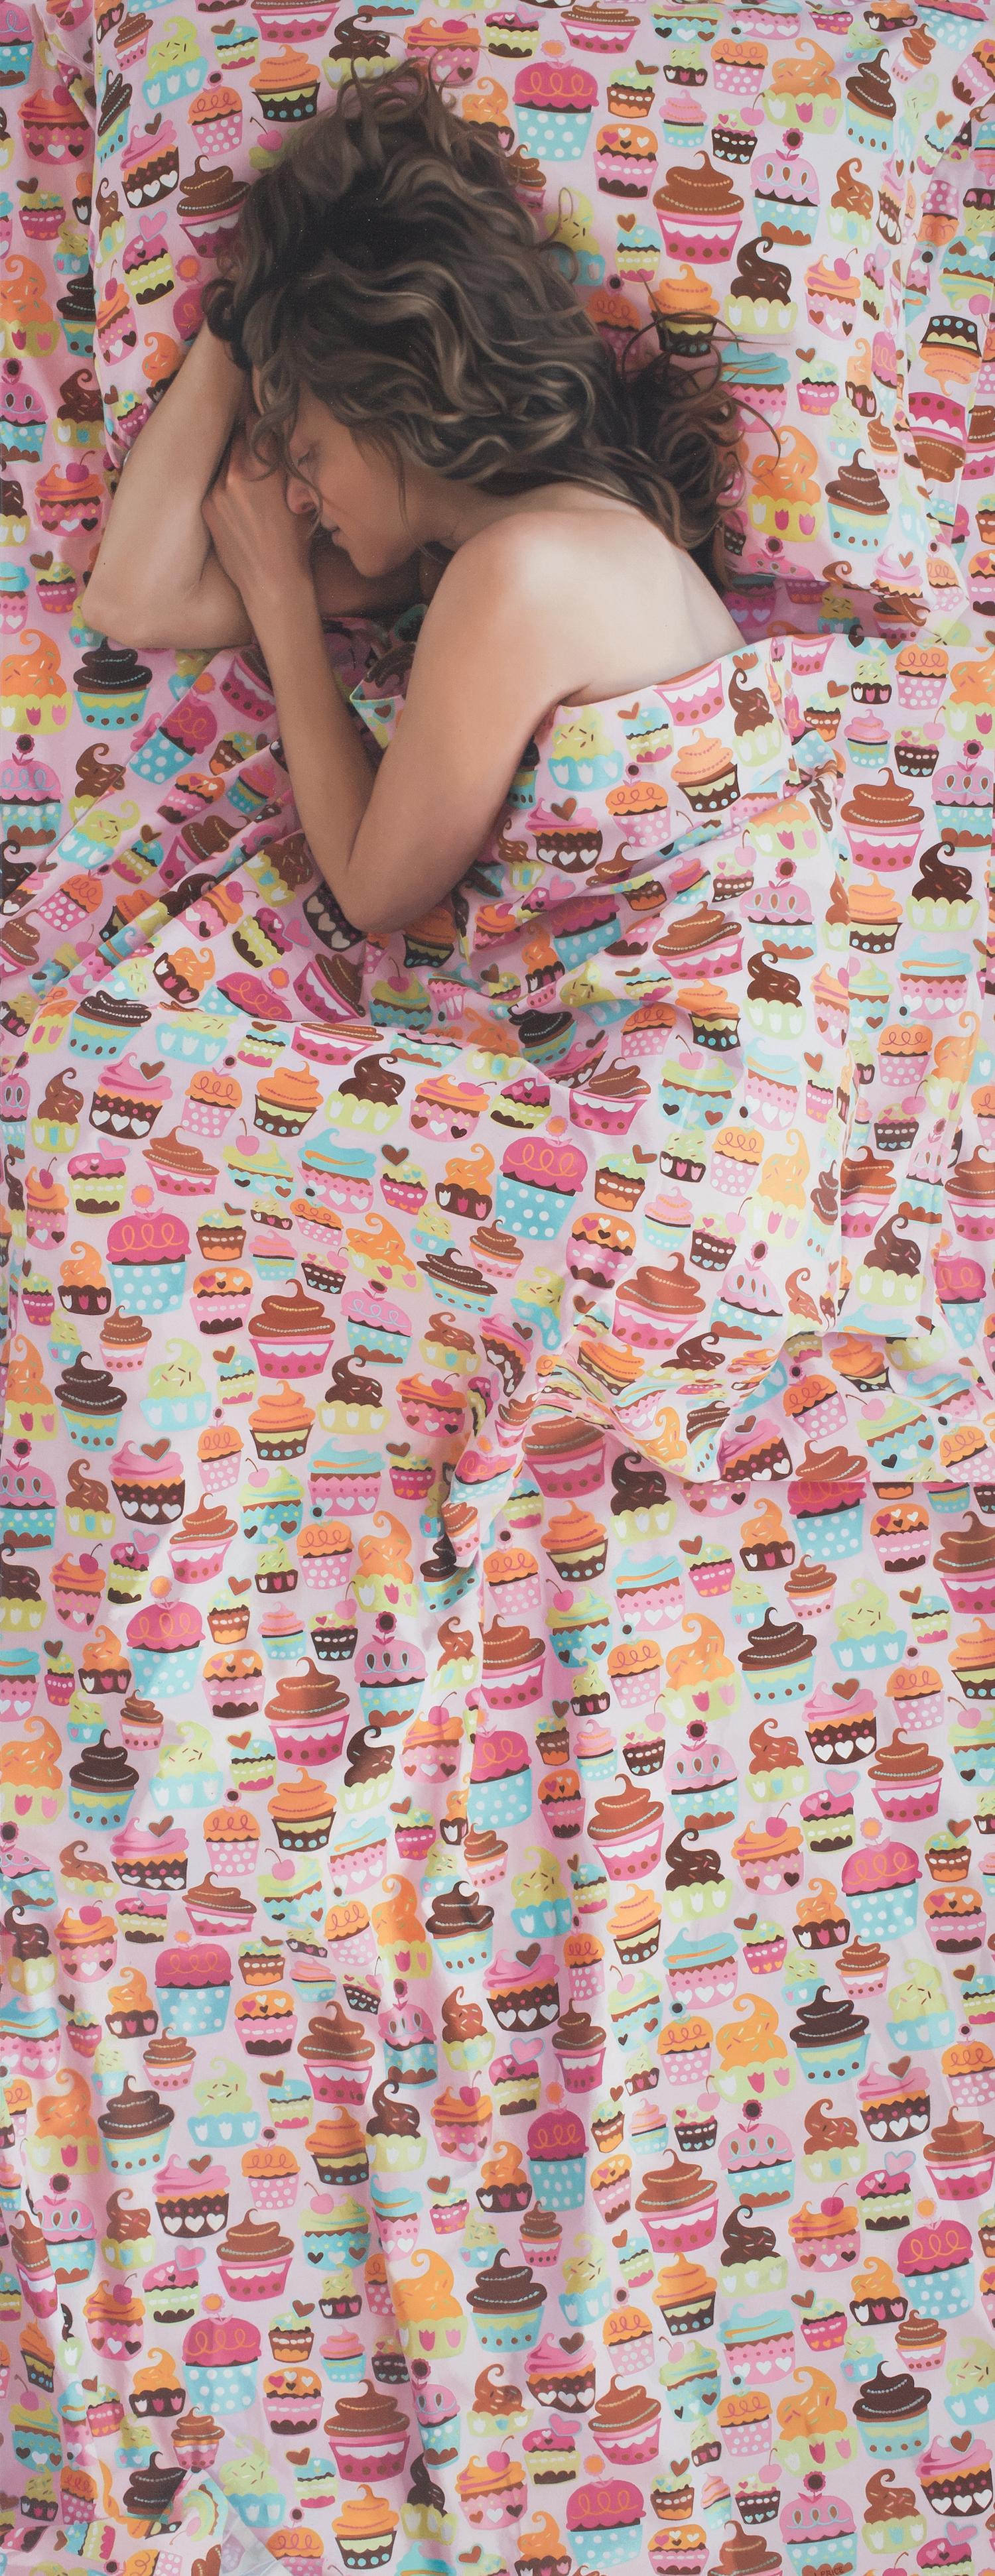 "Cupcakes  , 2013  Oil on Linen  65"" x25"""